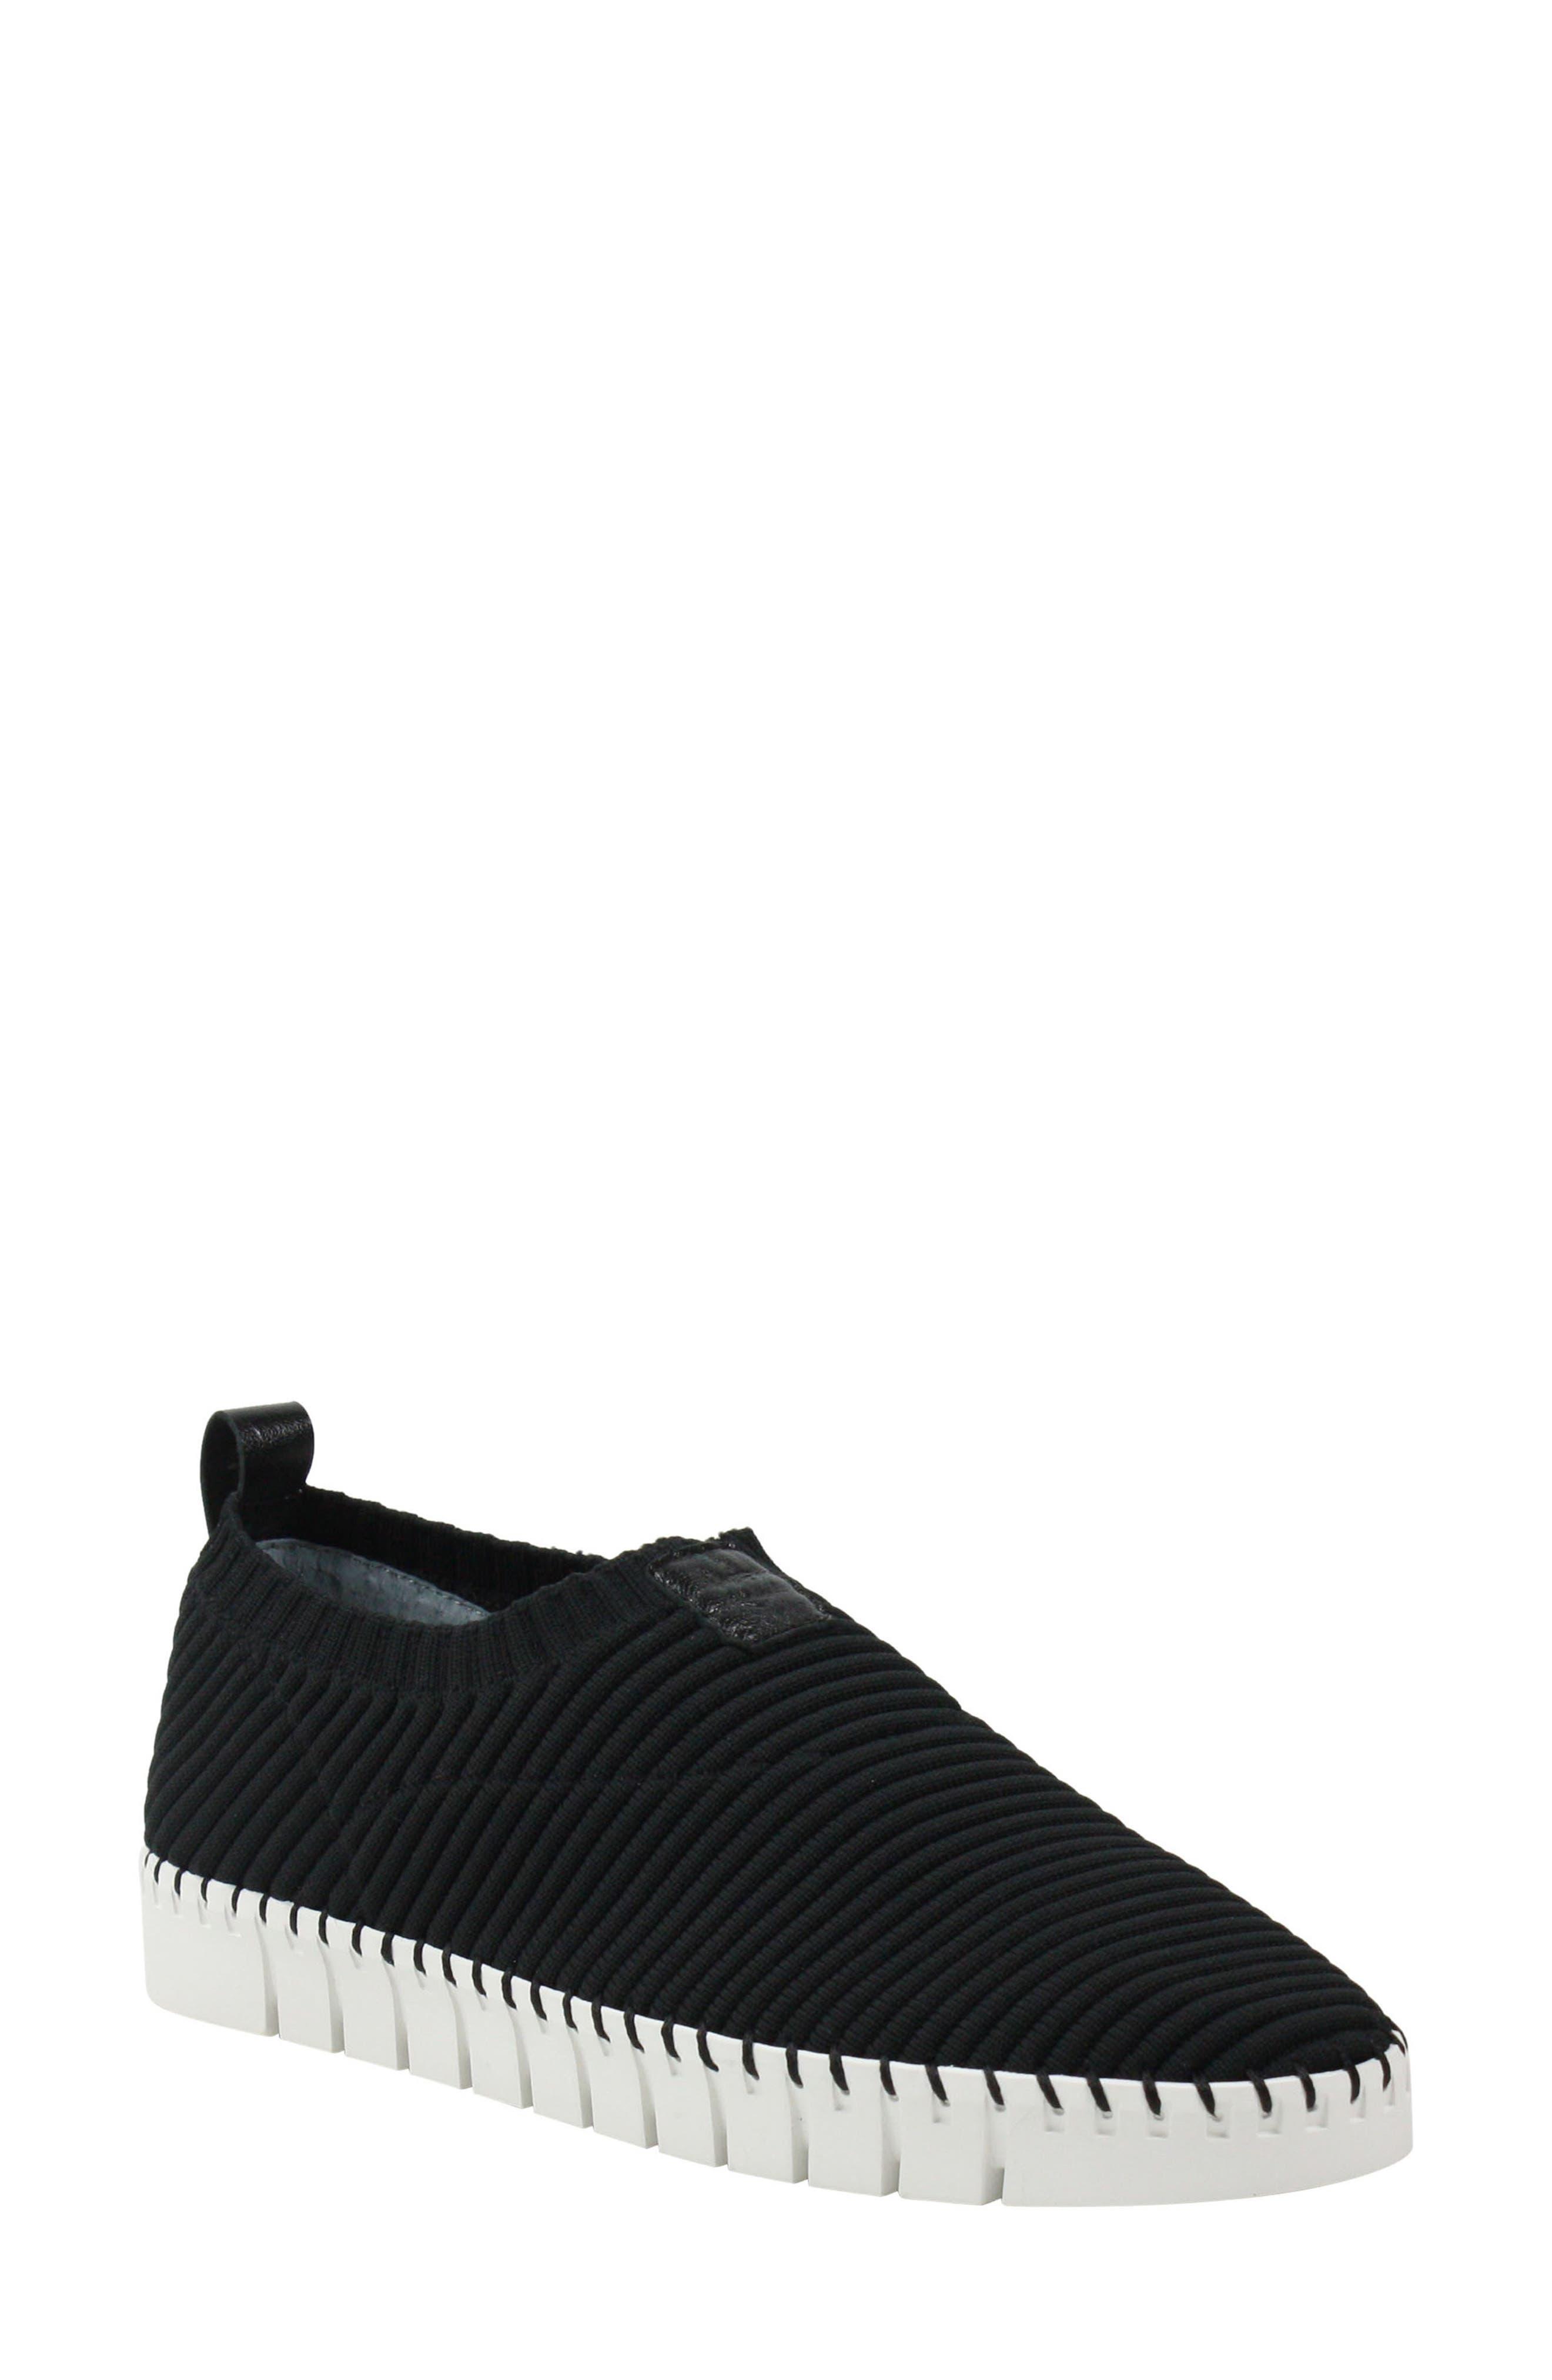 Women's J.renee Donnia Slip-On Sneaker